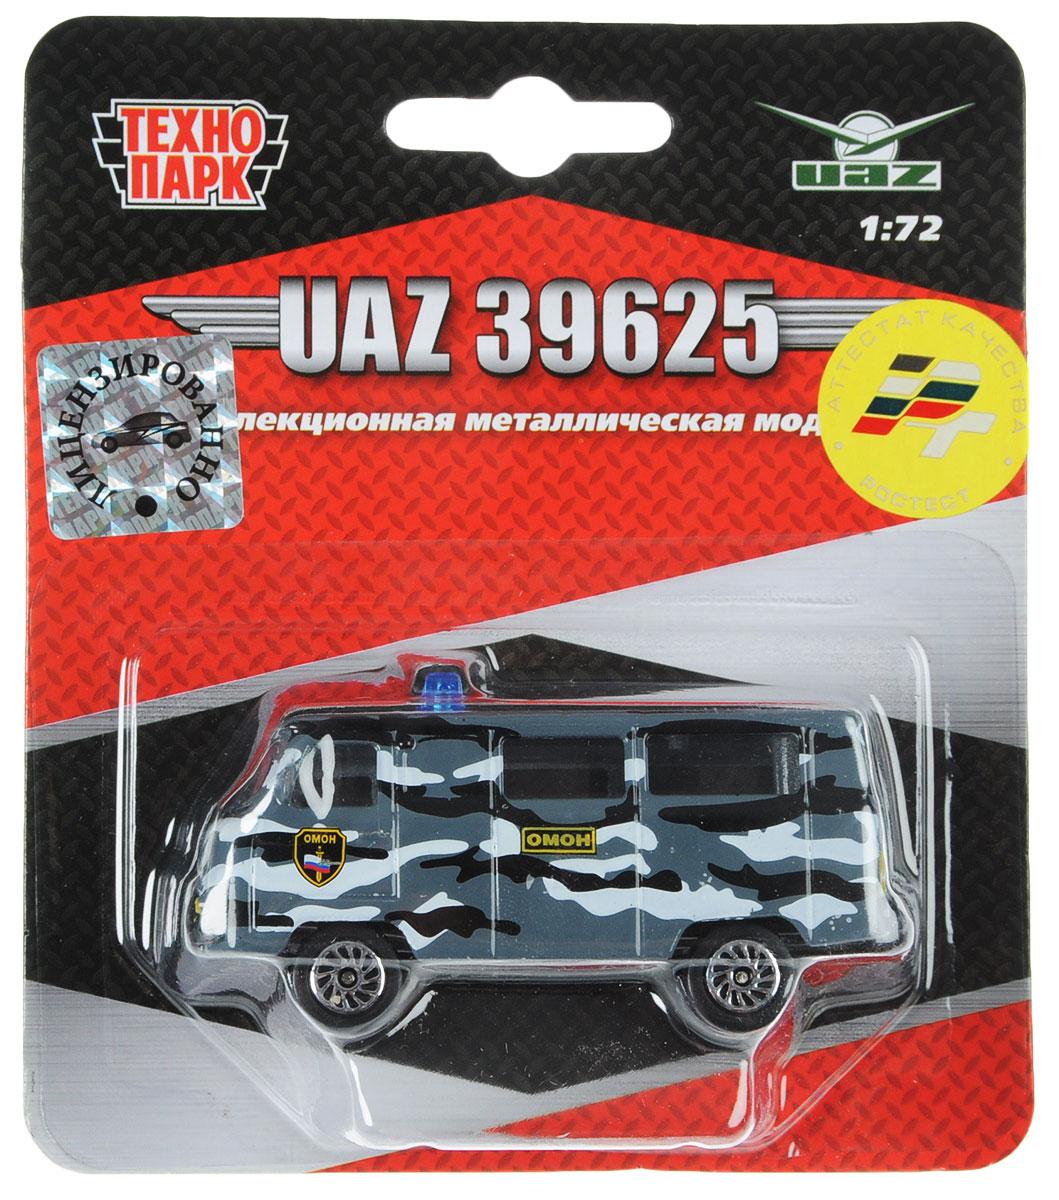 ТехноПарк Автомобиль UAZ 39625 Омон autotime модель автомобиля uaz 39625 омон